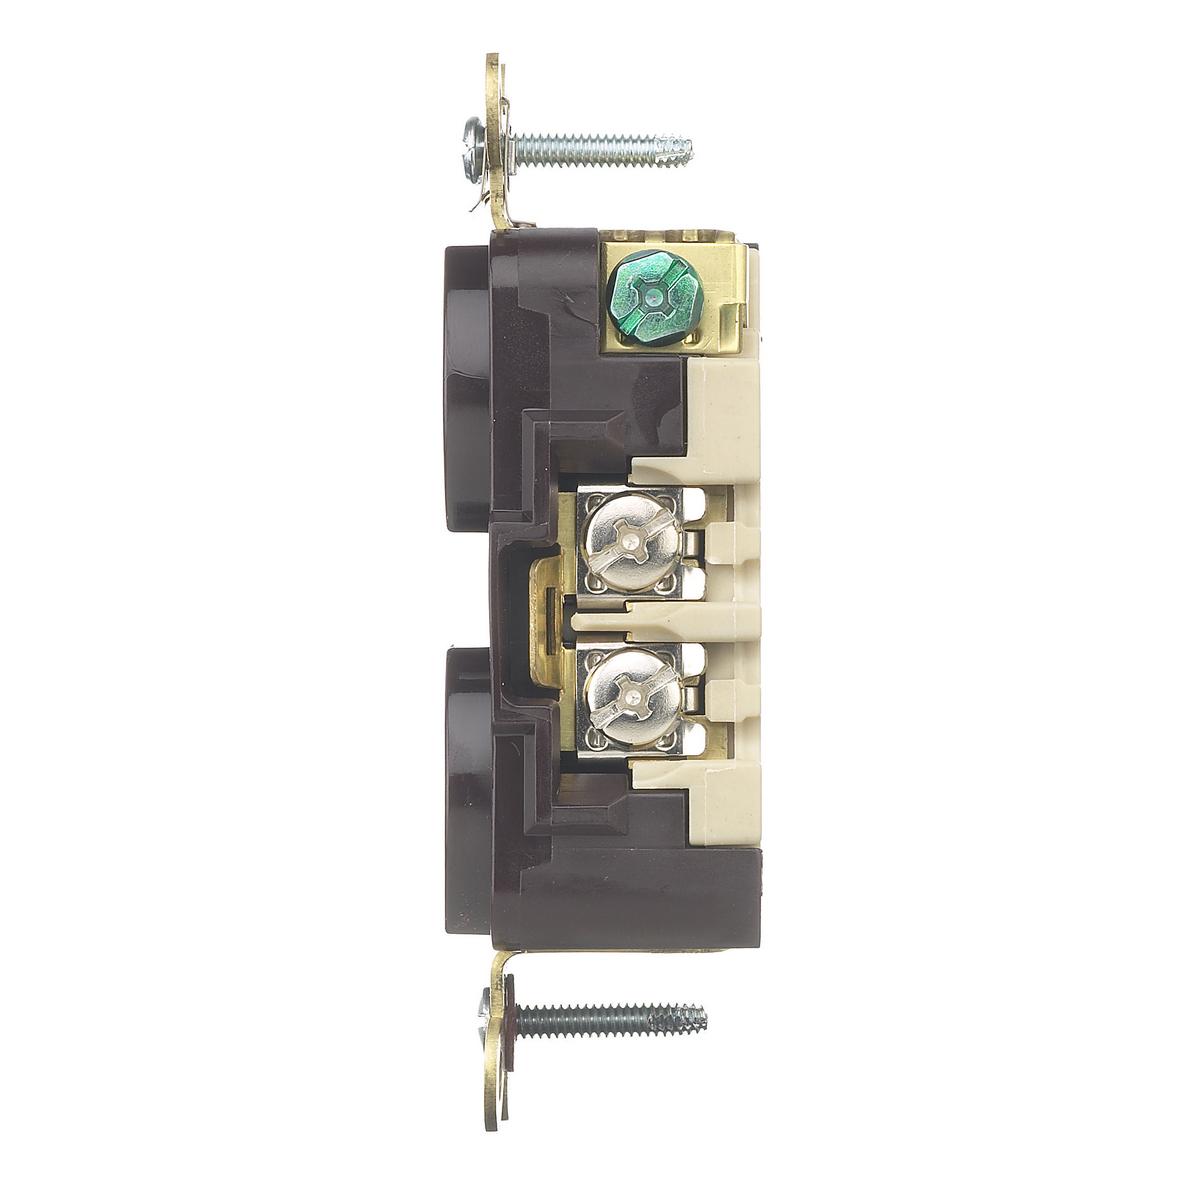 Hbl5262 Brand Wiring Device Kellems